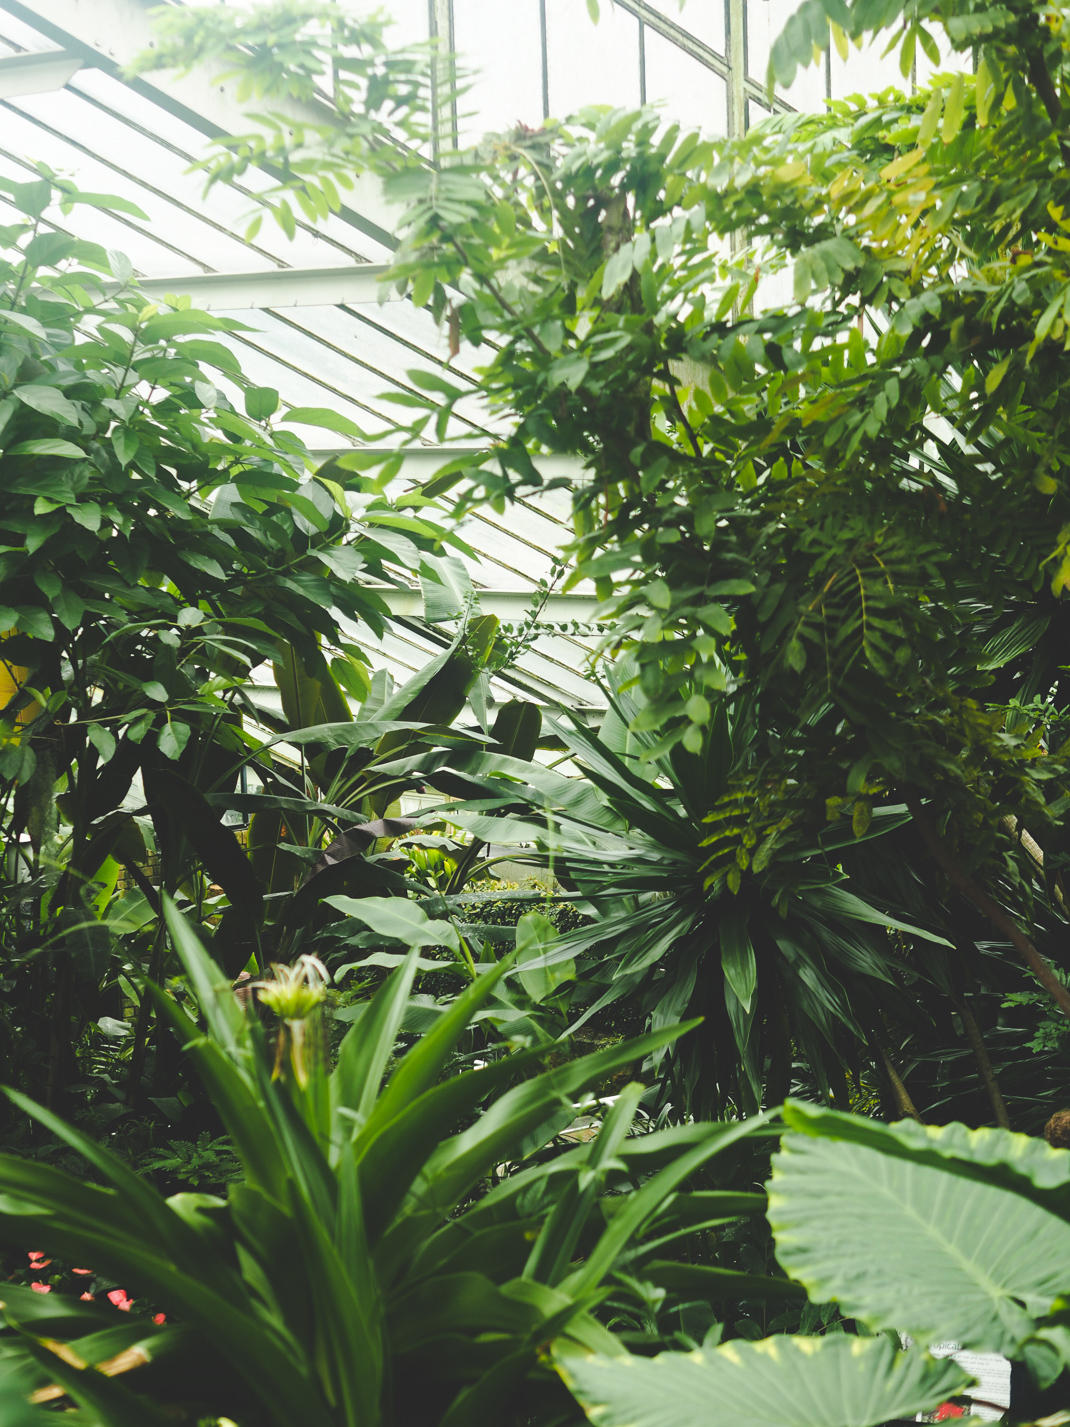 kew gardens tropical greenhouse